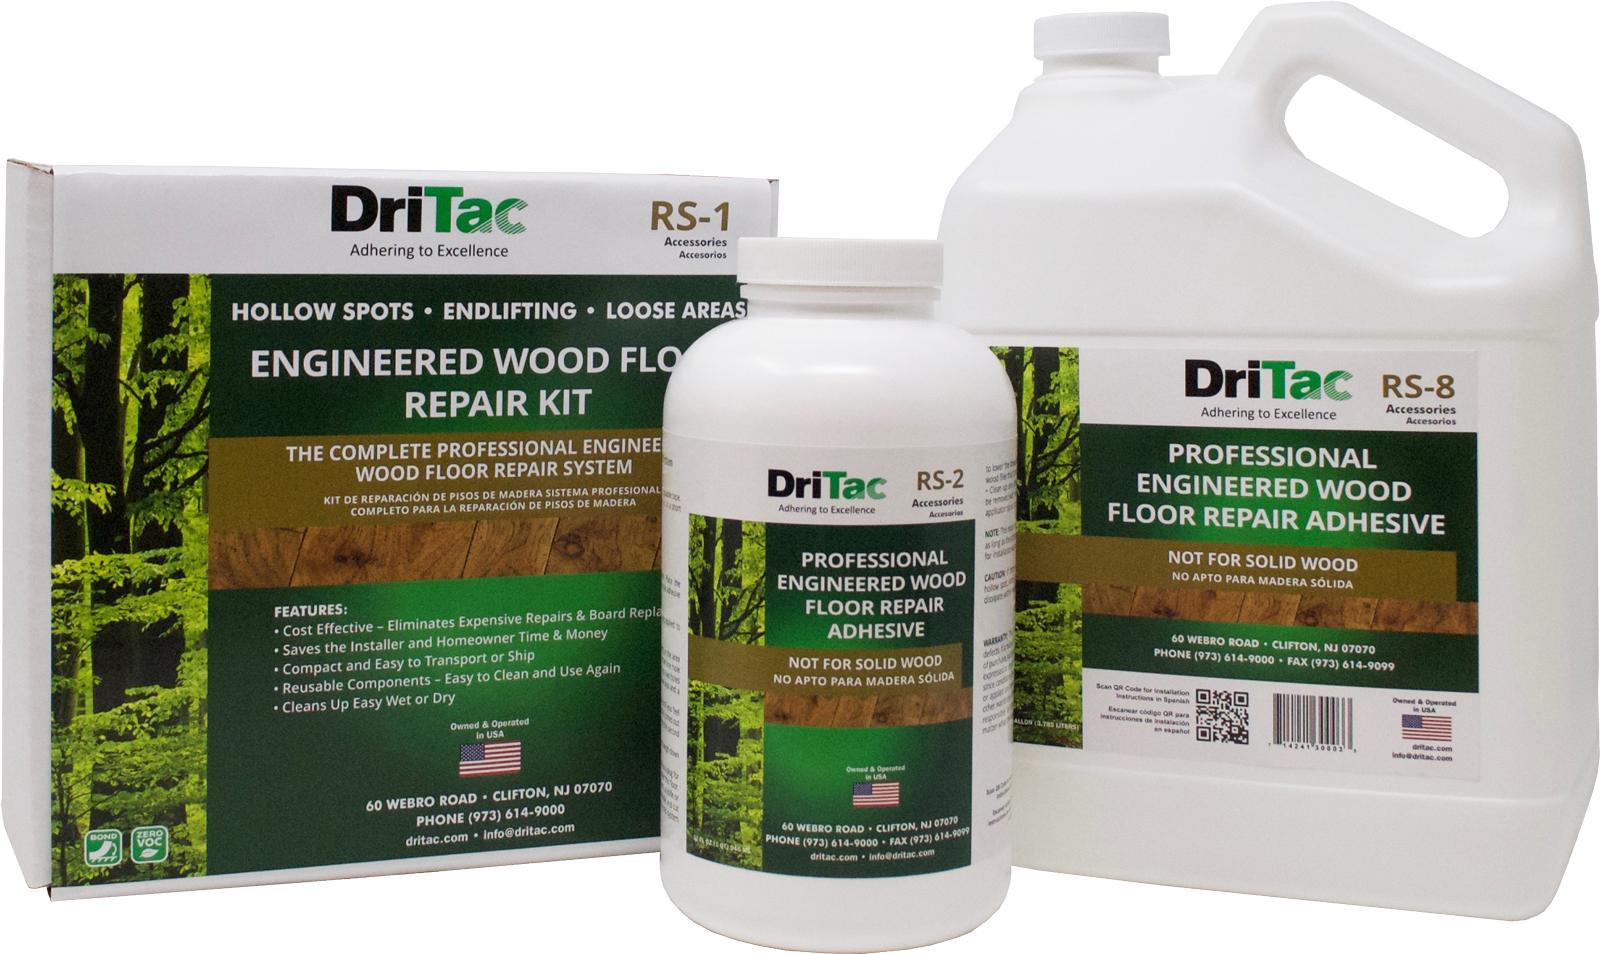 hardwood floor installation kit of installation instructions for dritacs premium flooring adhesive regarding repair kits